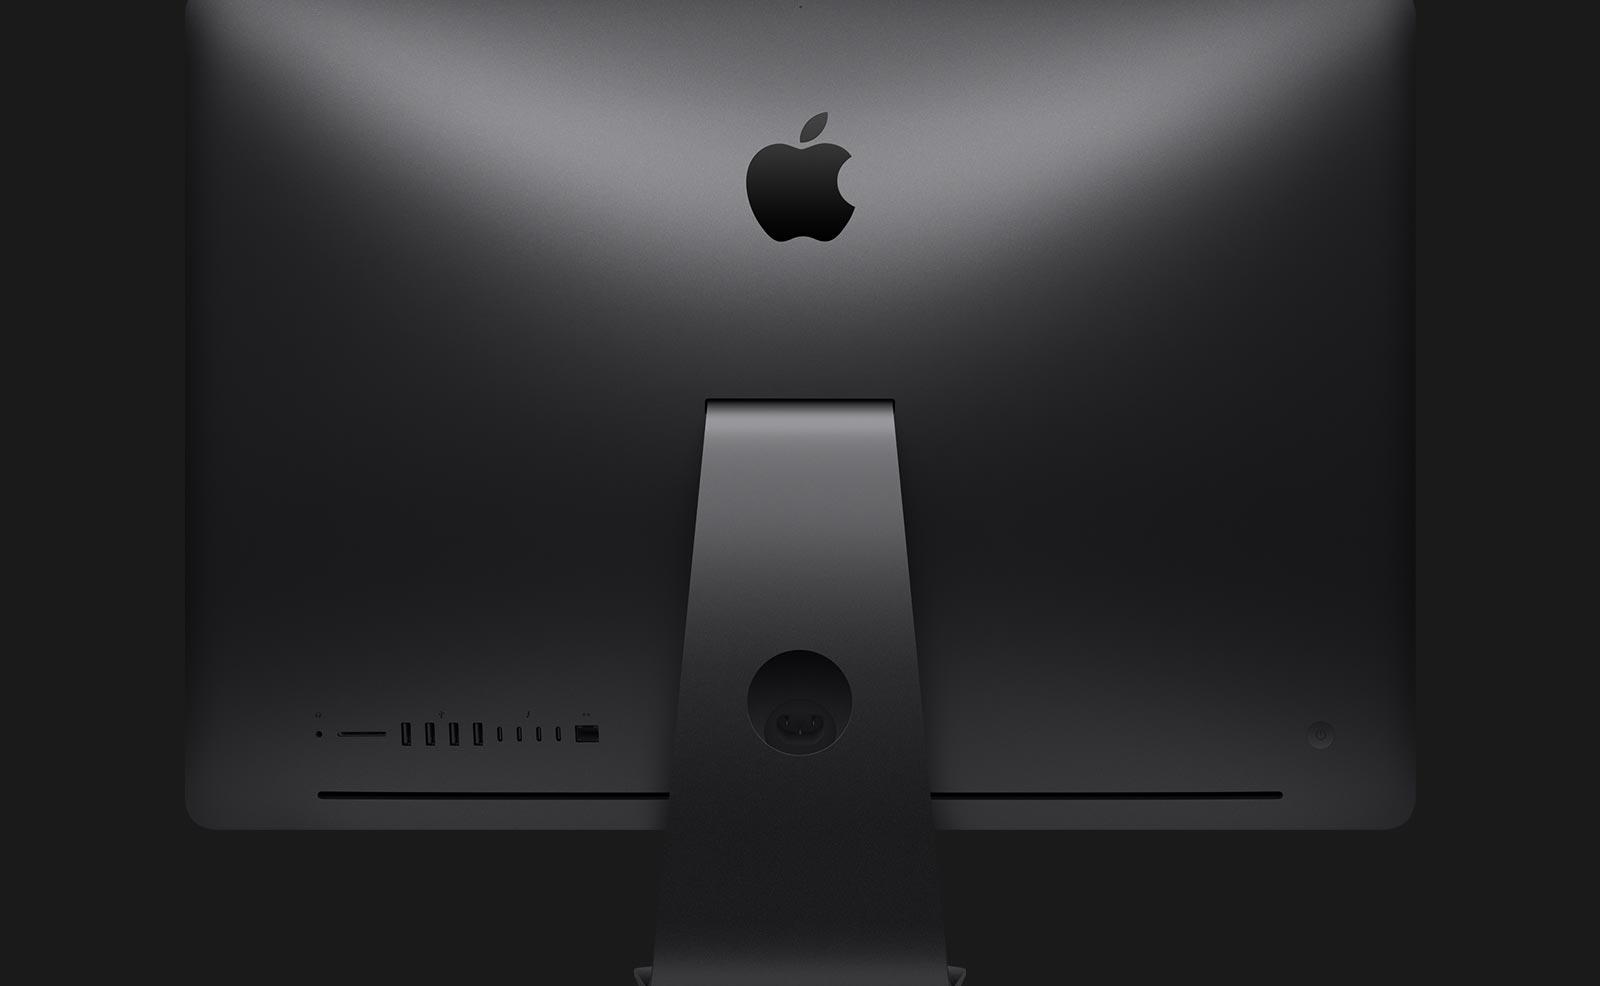 iMac Pro Thunderbolt 3